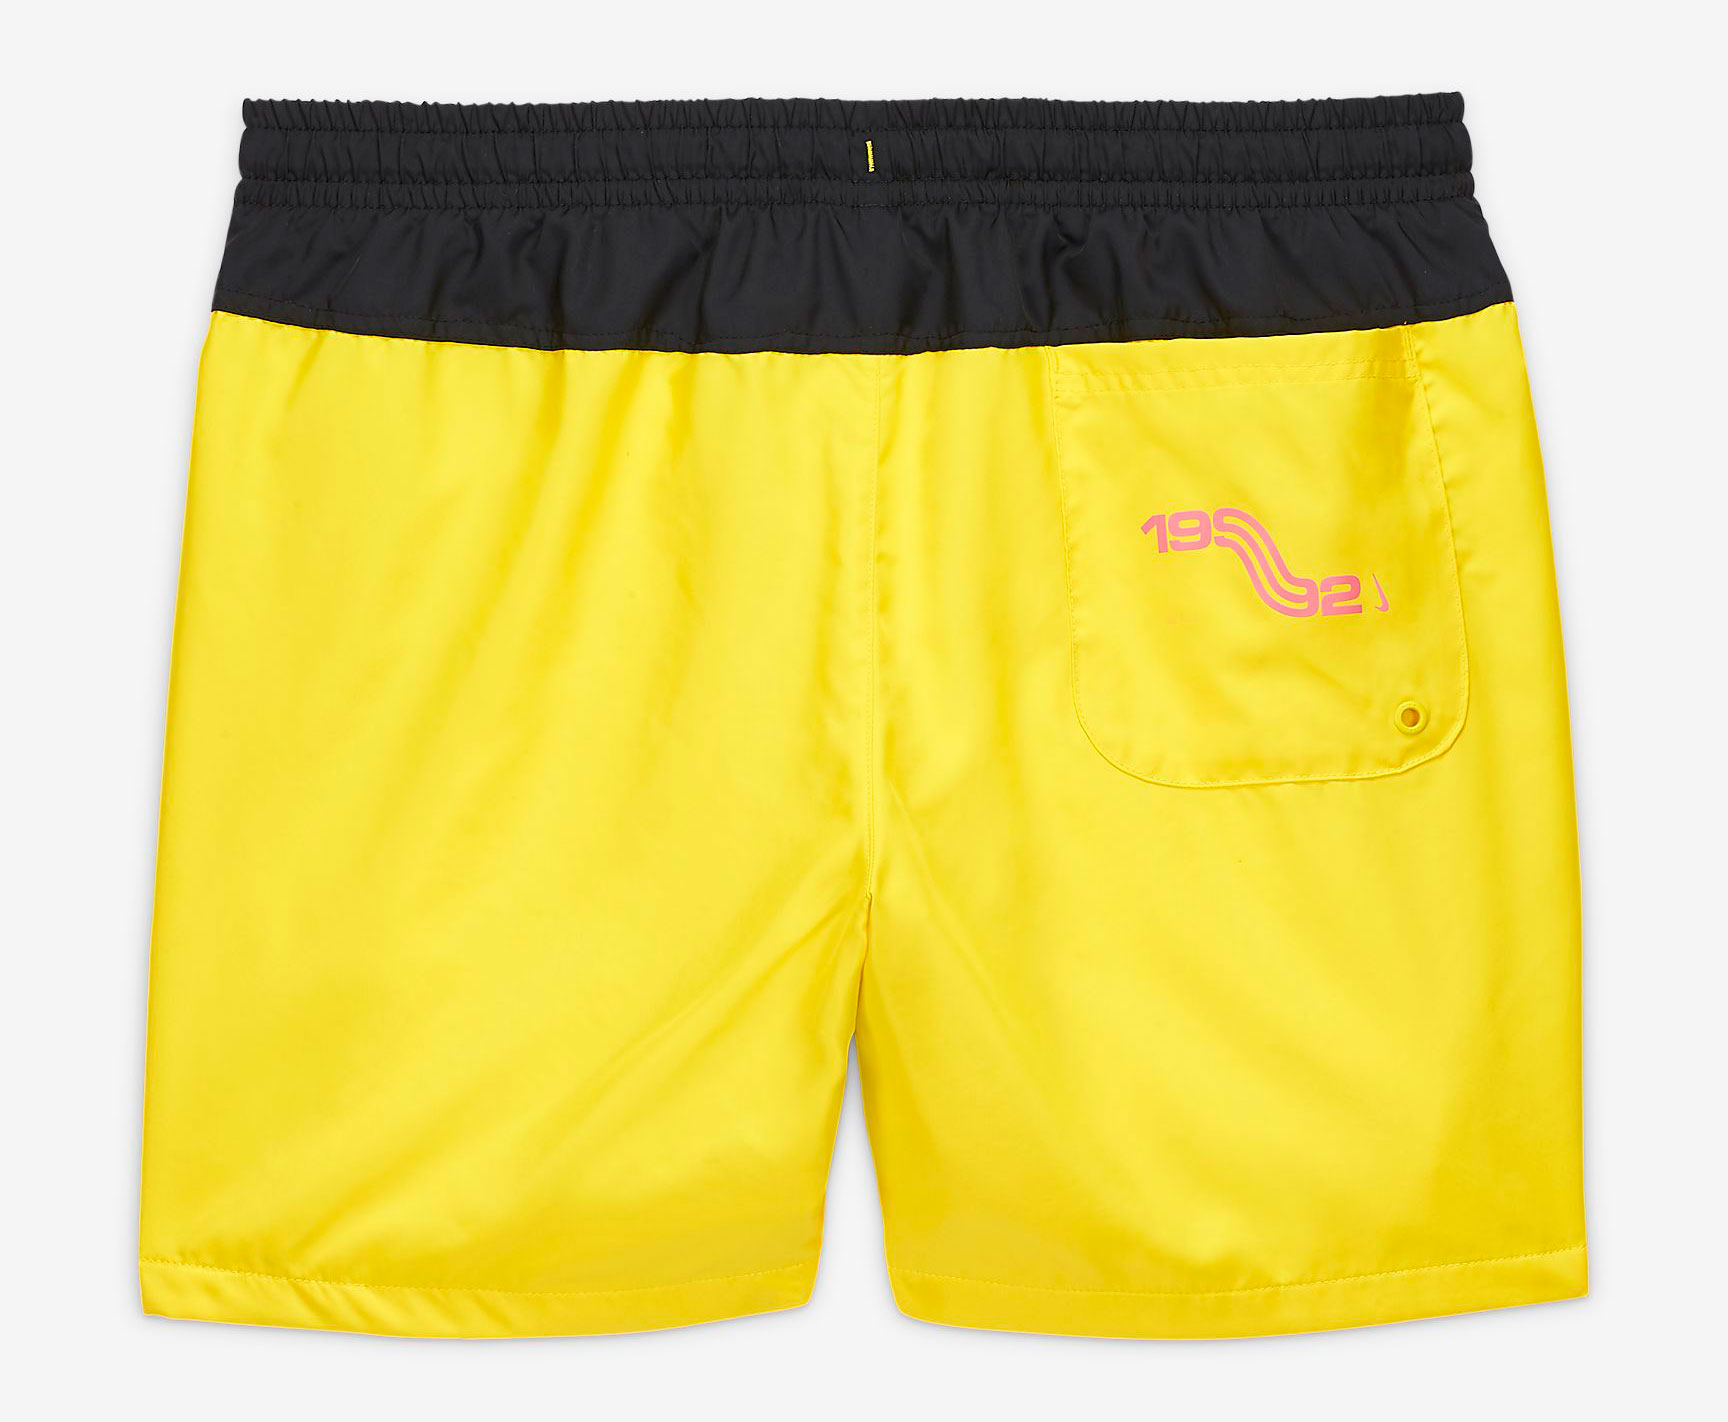 nike-kyrie-6-neon-graffiti-90s-shorts-yellow-2